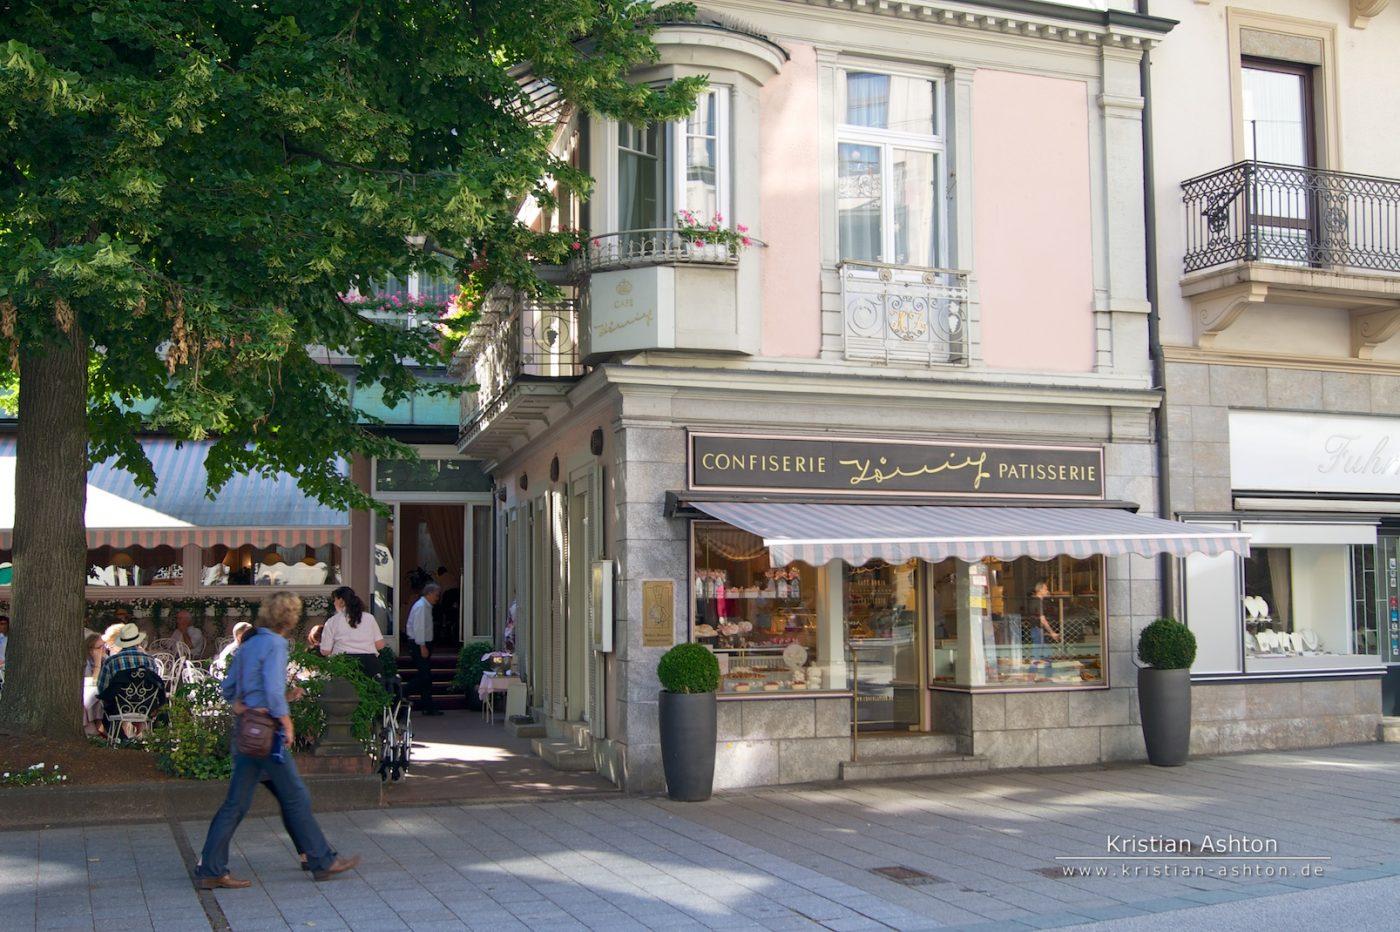 The famous Café König in Baden-Baden